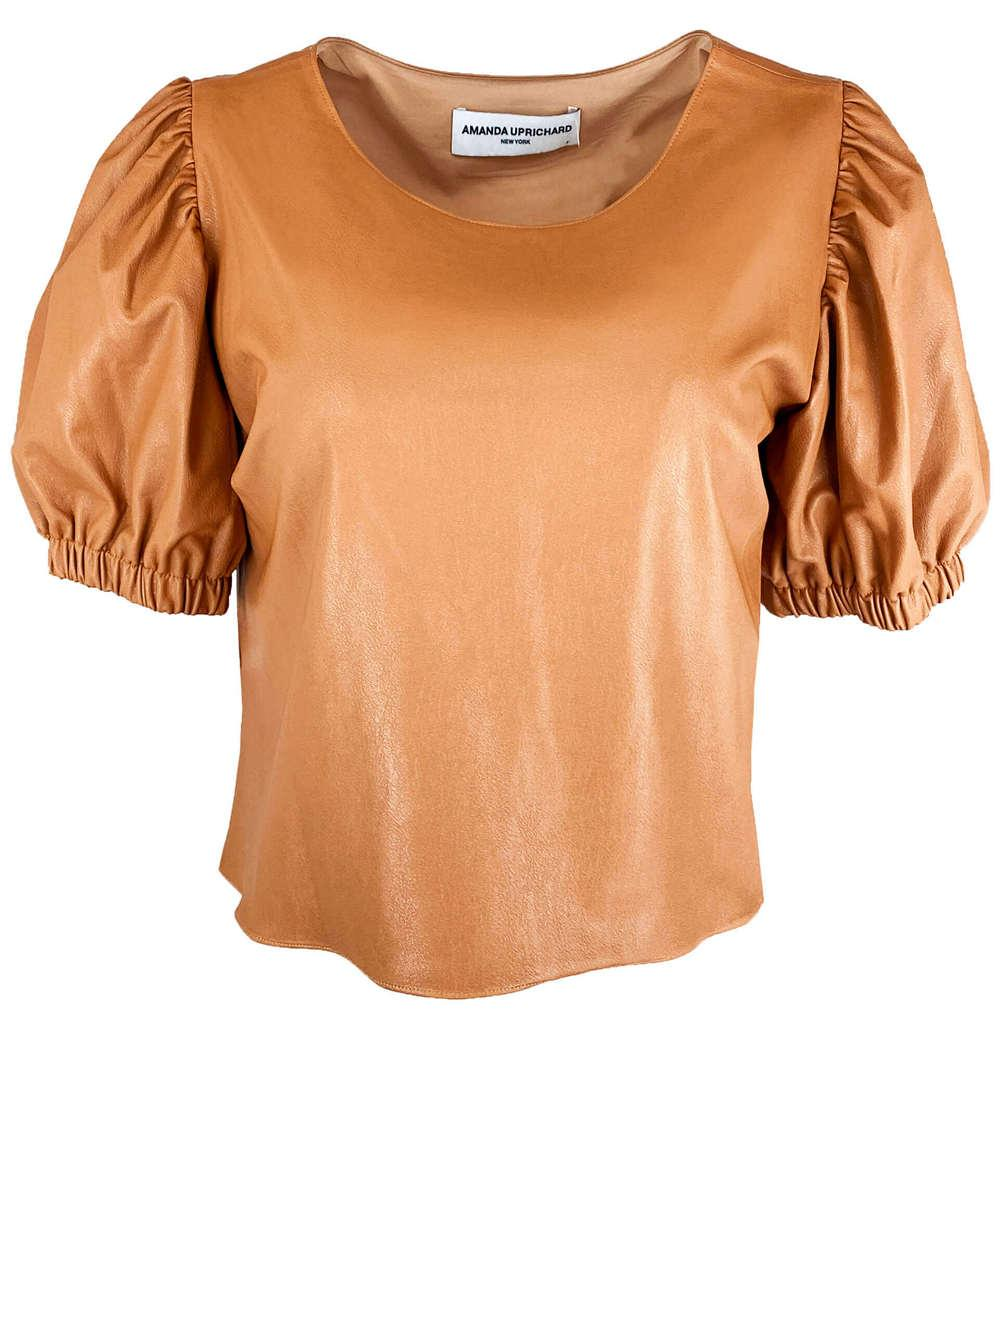 Heidi Faux Leather Top Item # SL-30488